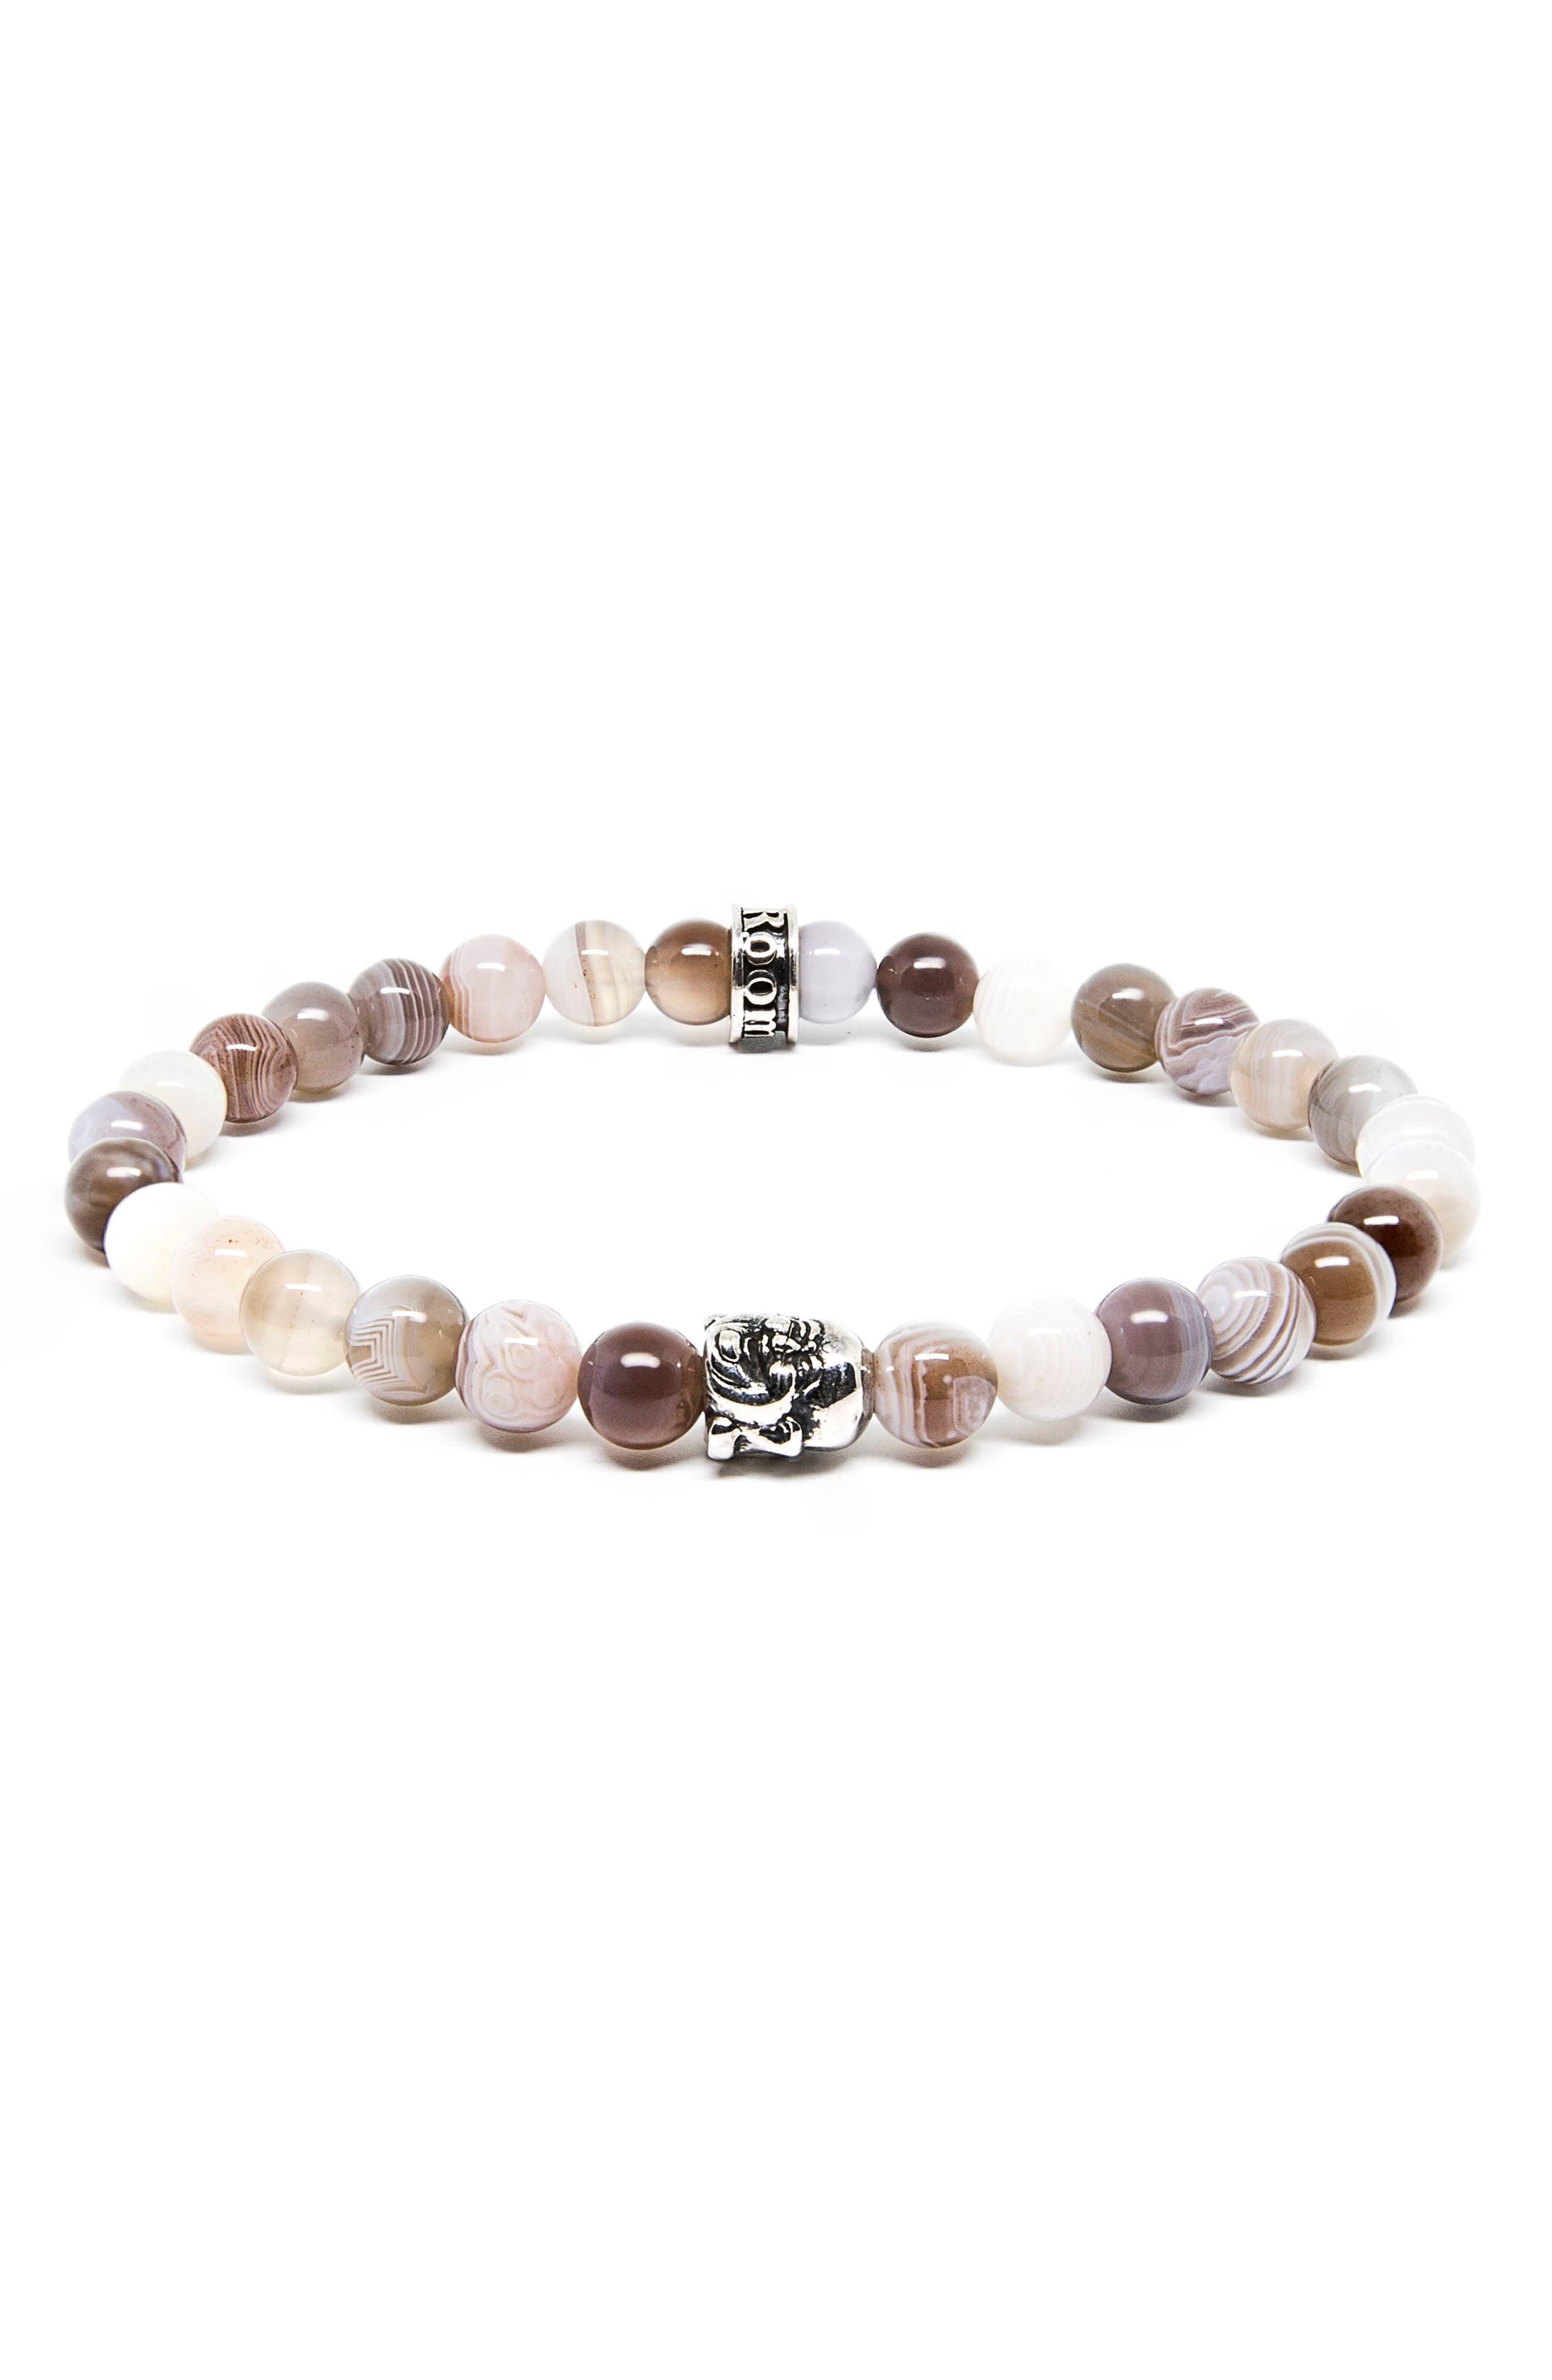 Agate Buddha Stretch Bracelet,                             Main thumbnail 1, color,                             060